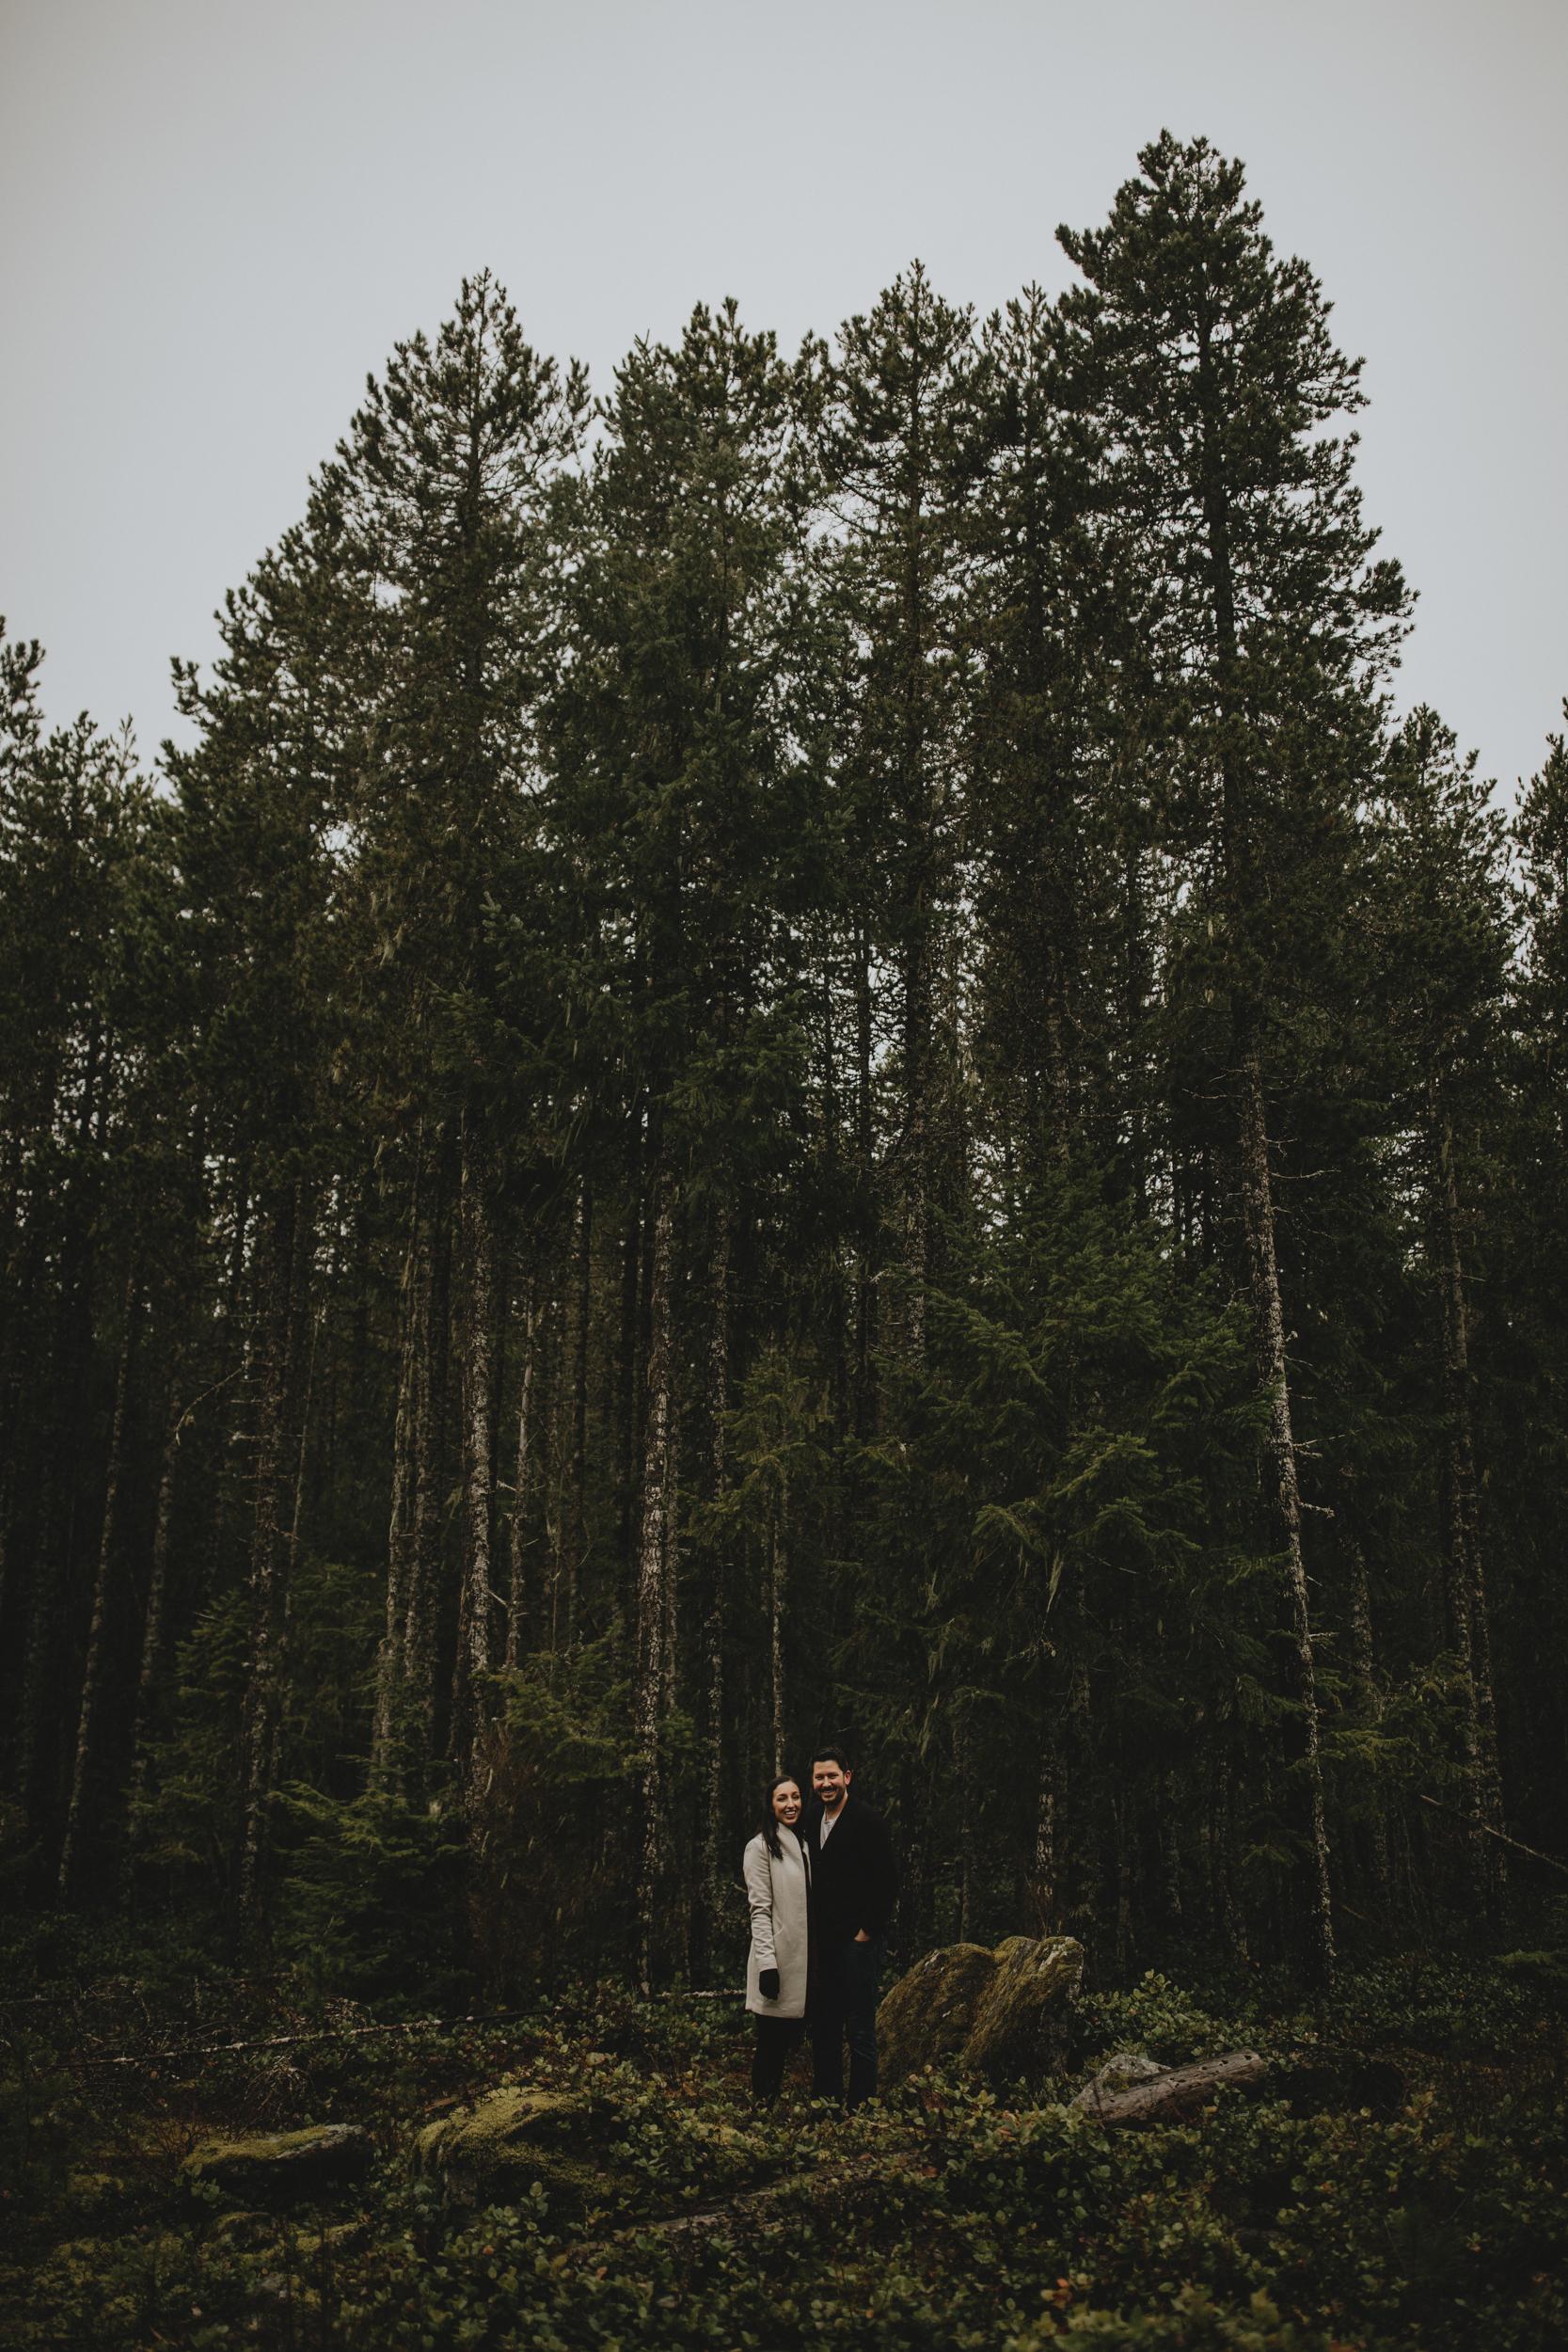 Chilliwack-Lake-Engagement-Vancouver-3.jpg